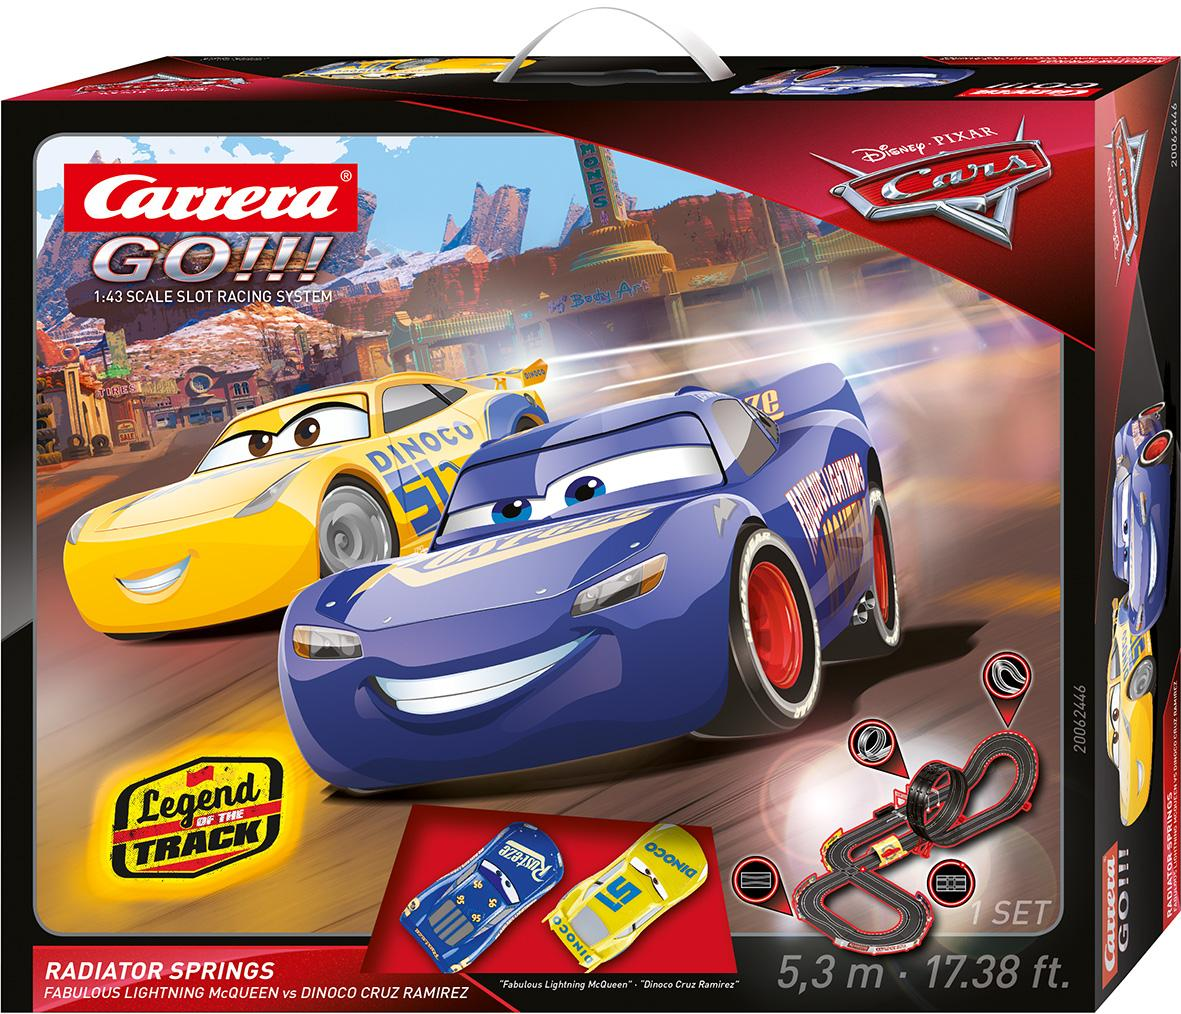 CARRERA GO!!! DISNEY PIXAR CARS RADIATOR SPRINGS COD. 20062446